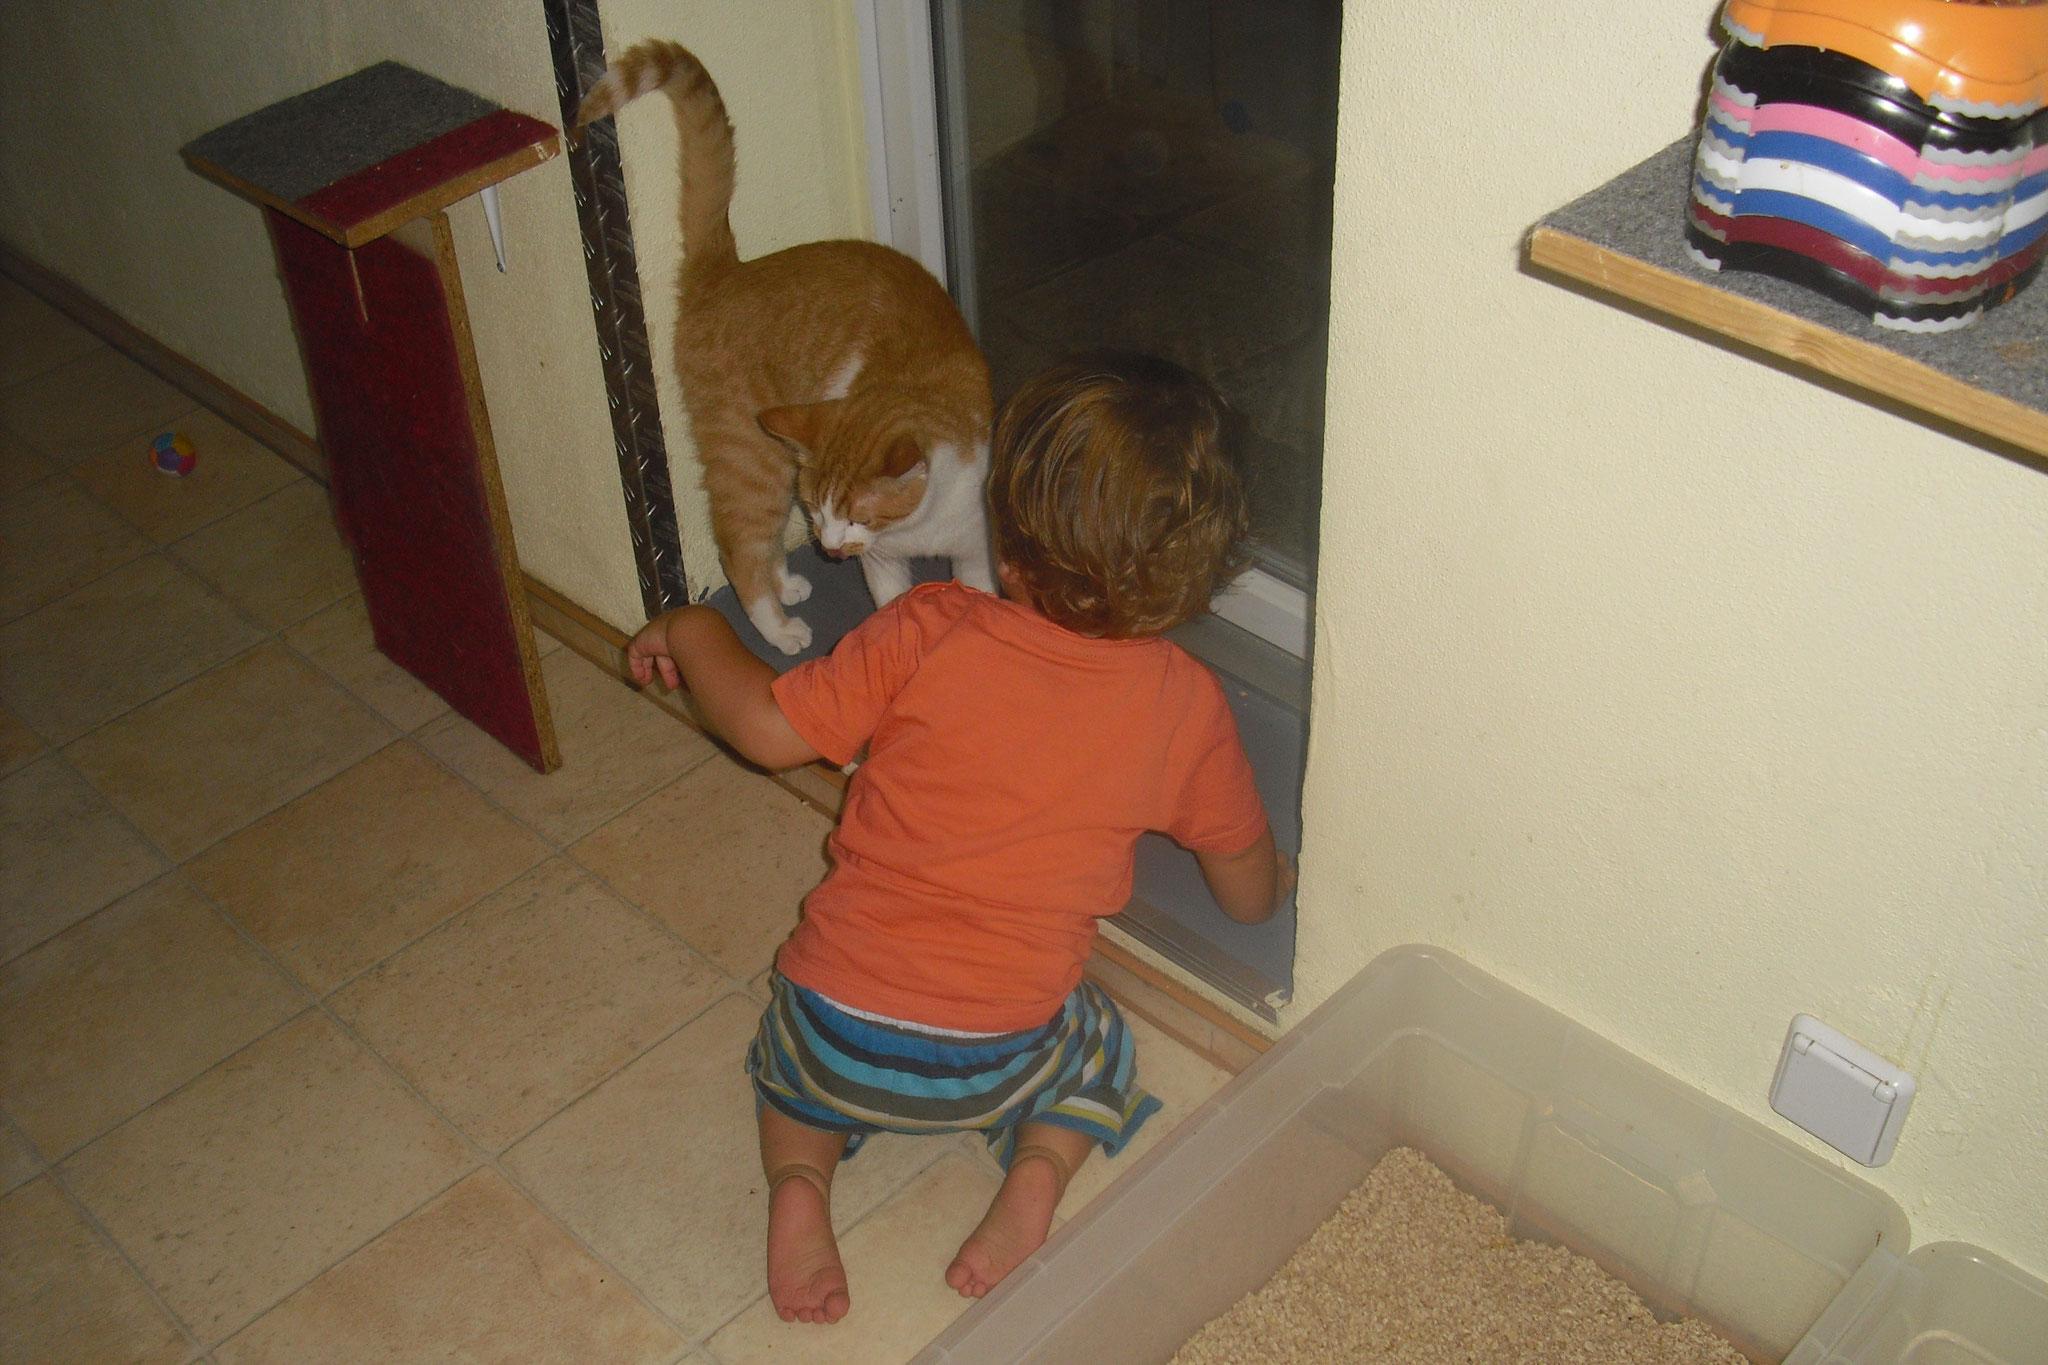 Moritz mag kleine Kinder